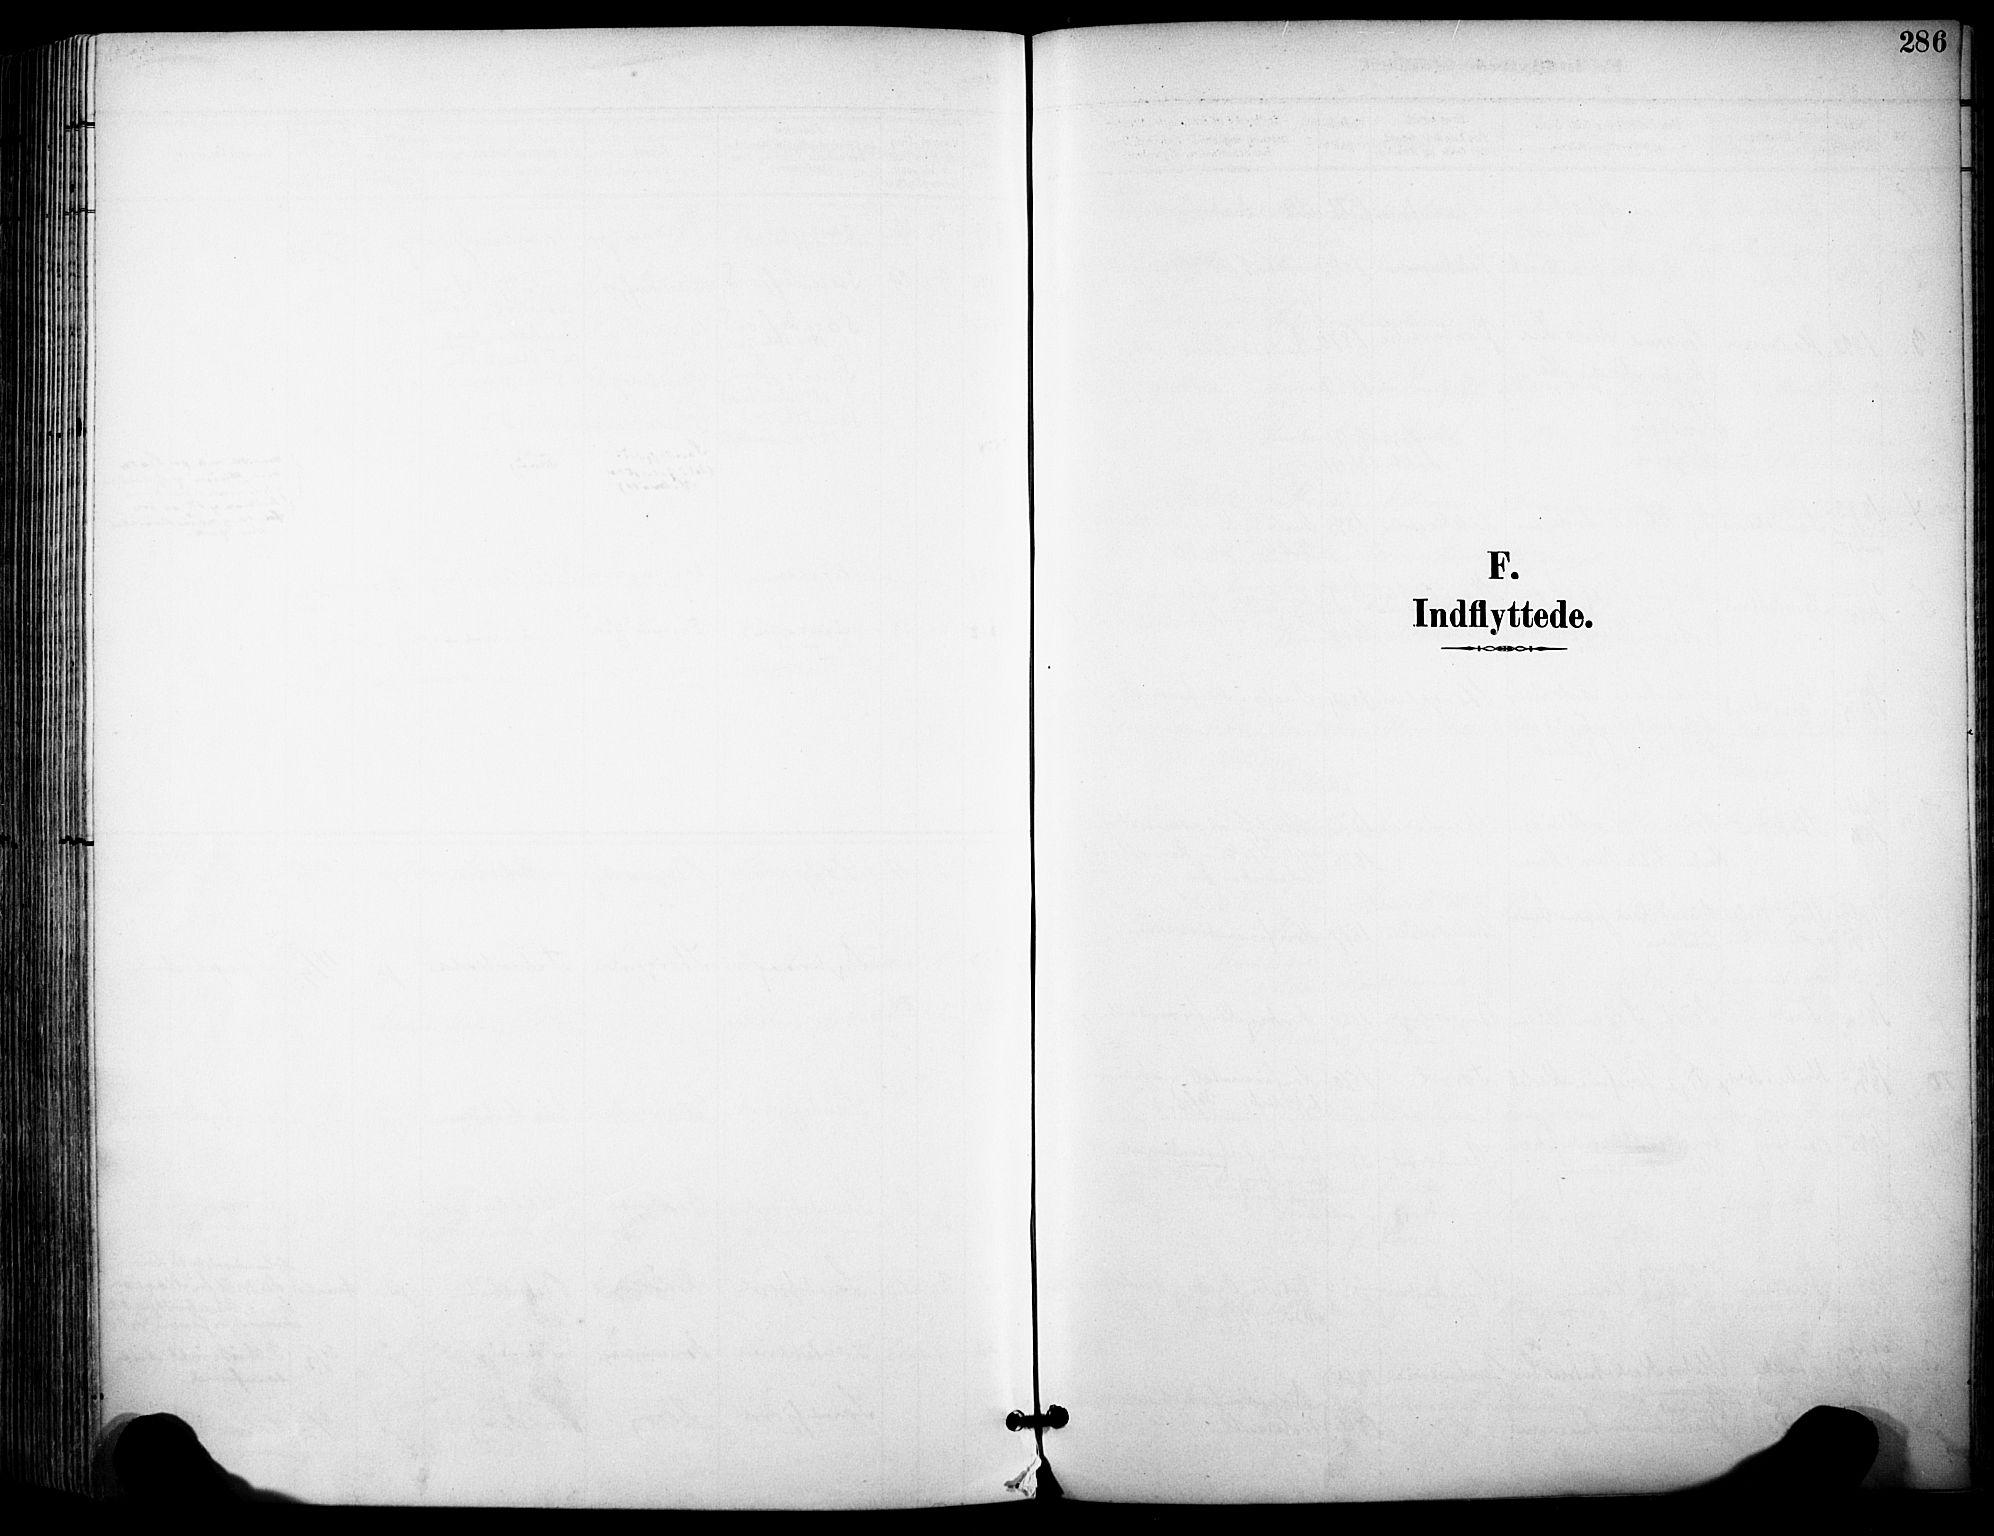 SAKO, Sandefjord kirkebøker, F/Fa/L0004: Parish register (official) no. 4, 1894-1905, p. 286